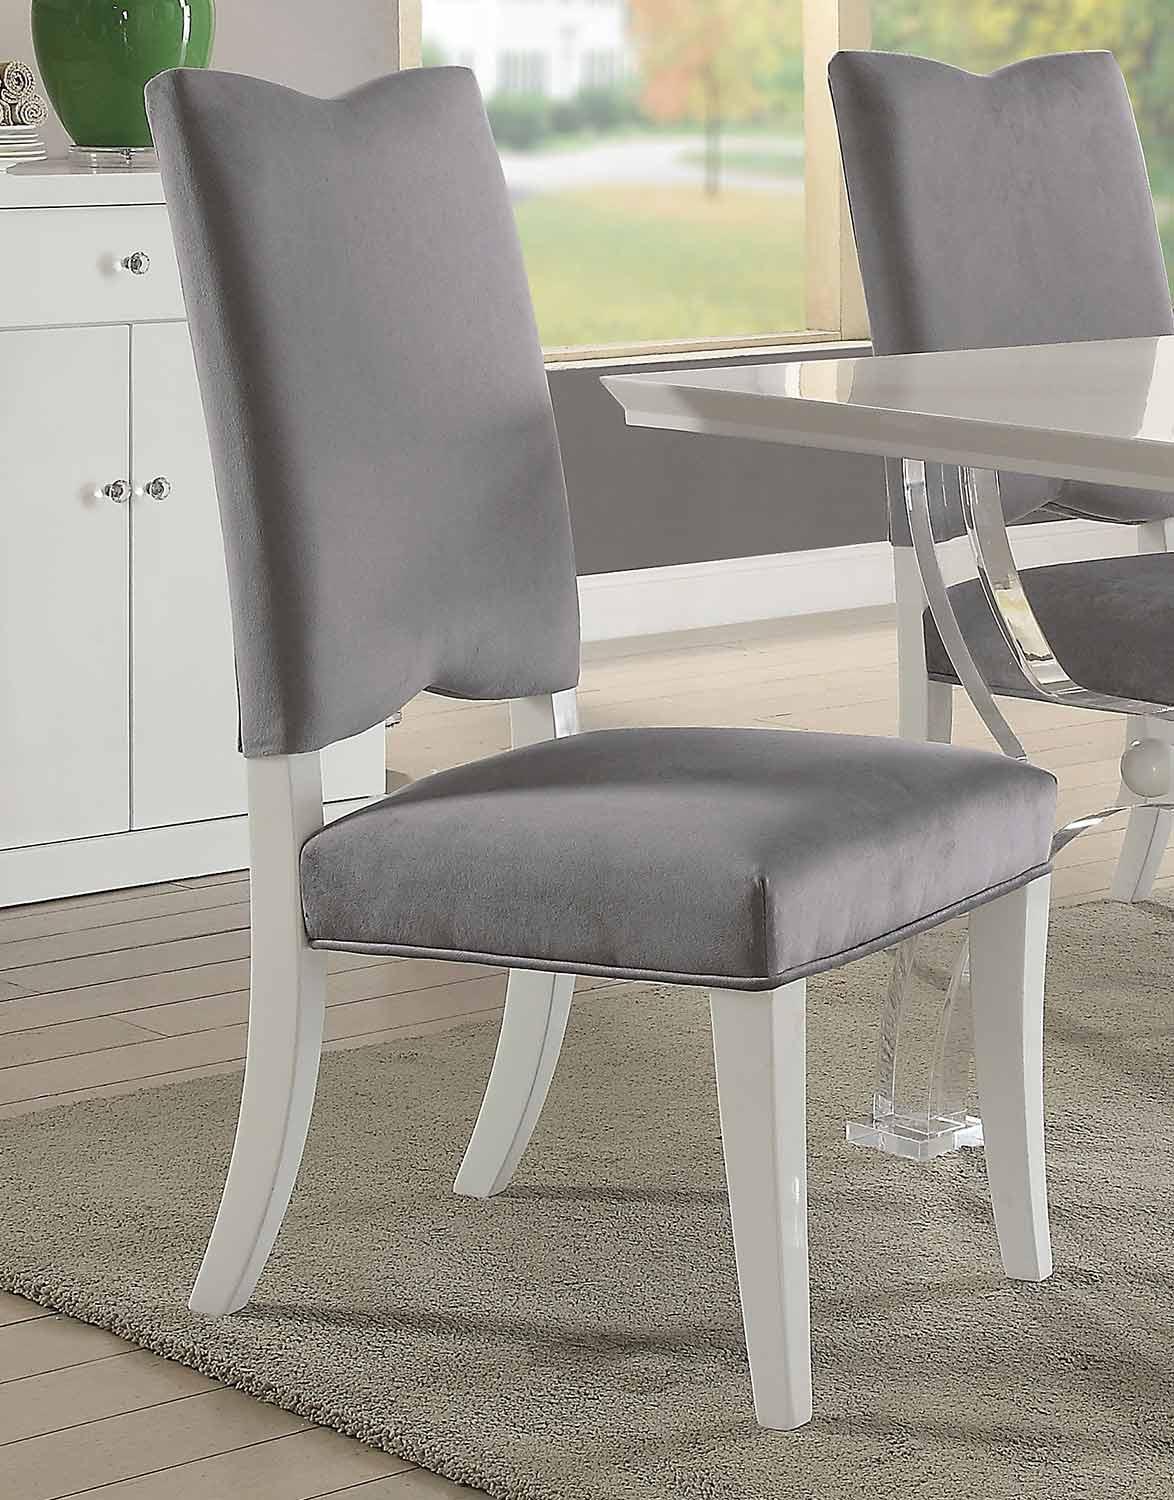 Acme Martinus Side Chair - Gray Fabric/White